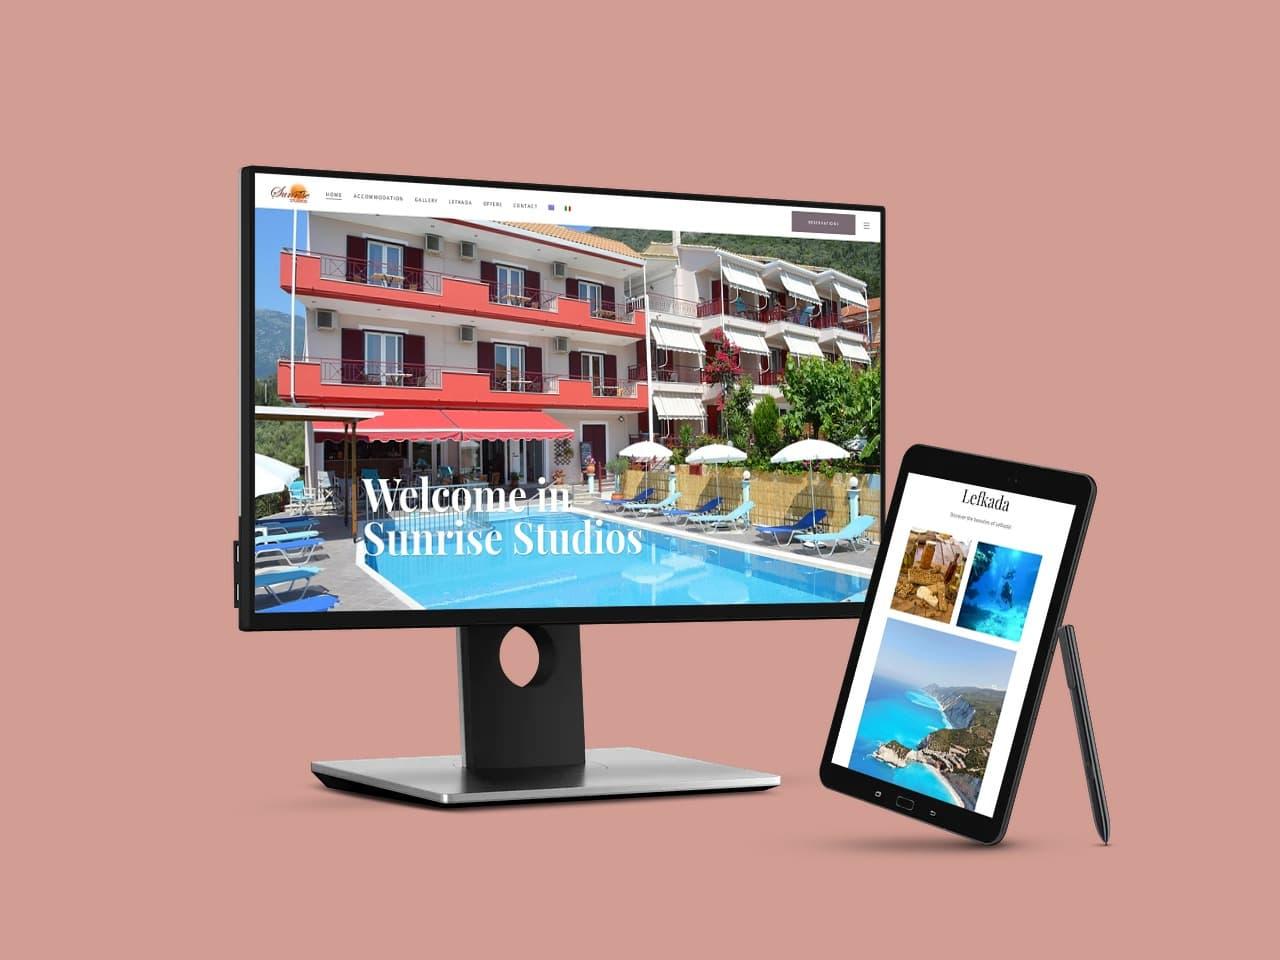 Sunrise Studios Lefkada Luxury Rooms & Apartments Λευκάδα Στούντιο & Διαμερίσματα